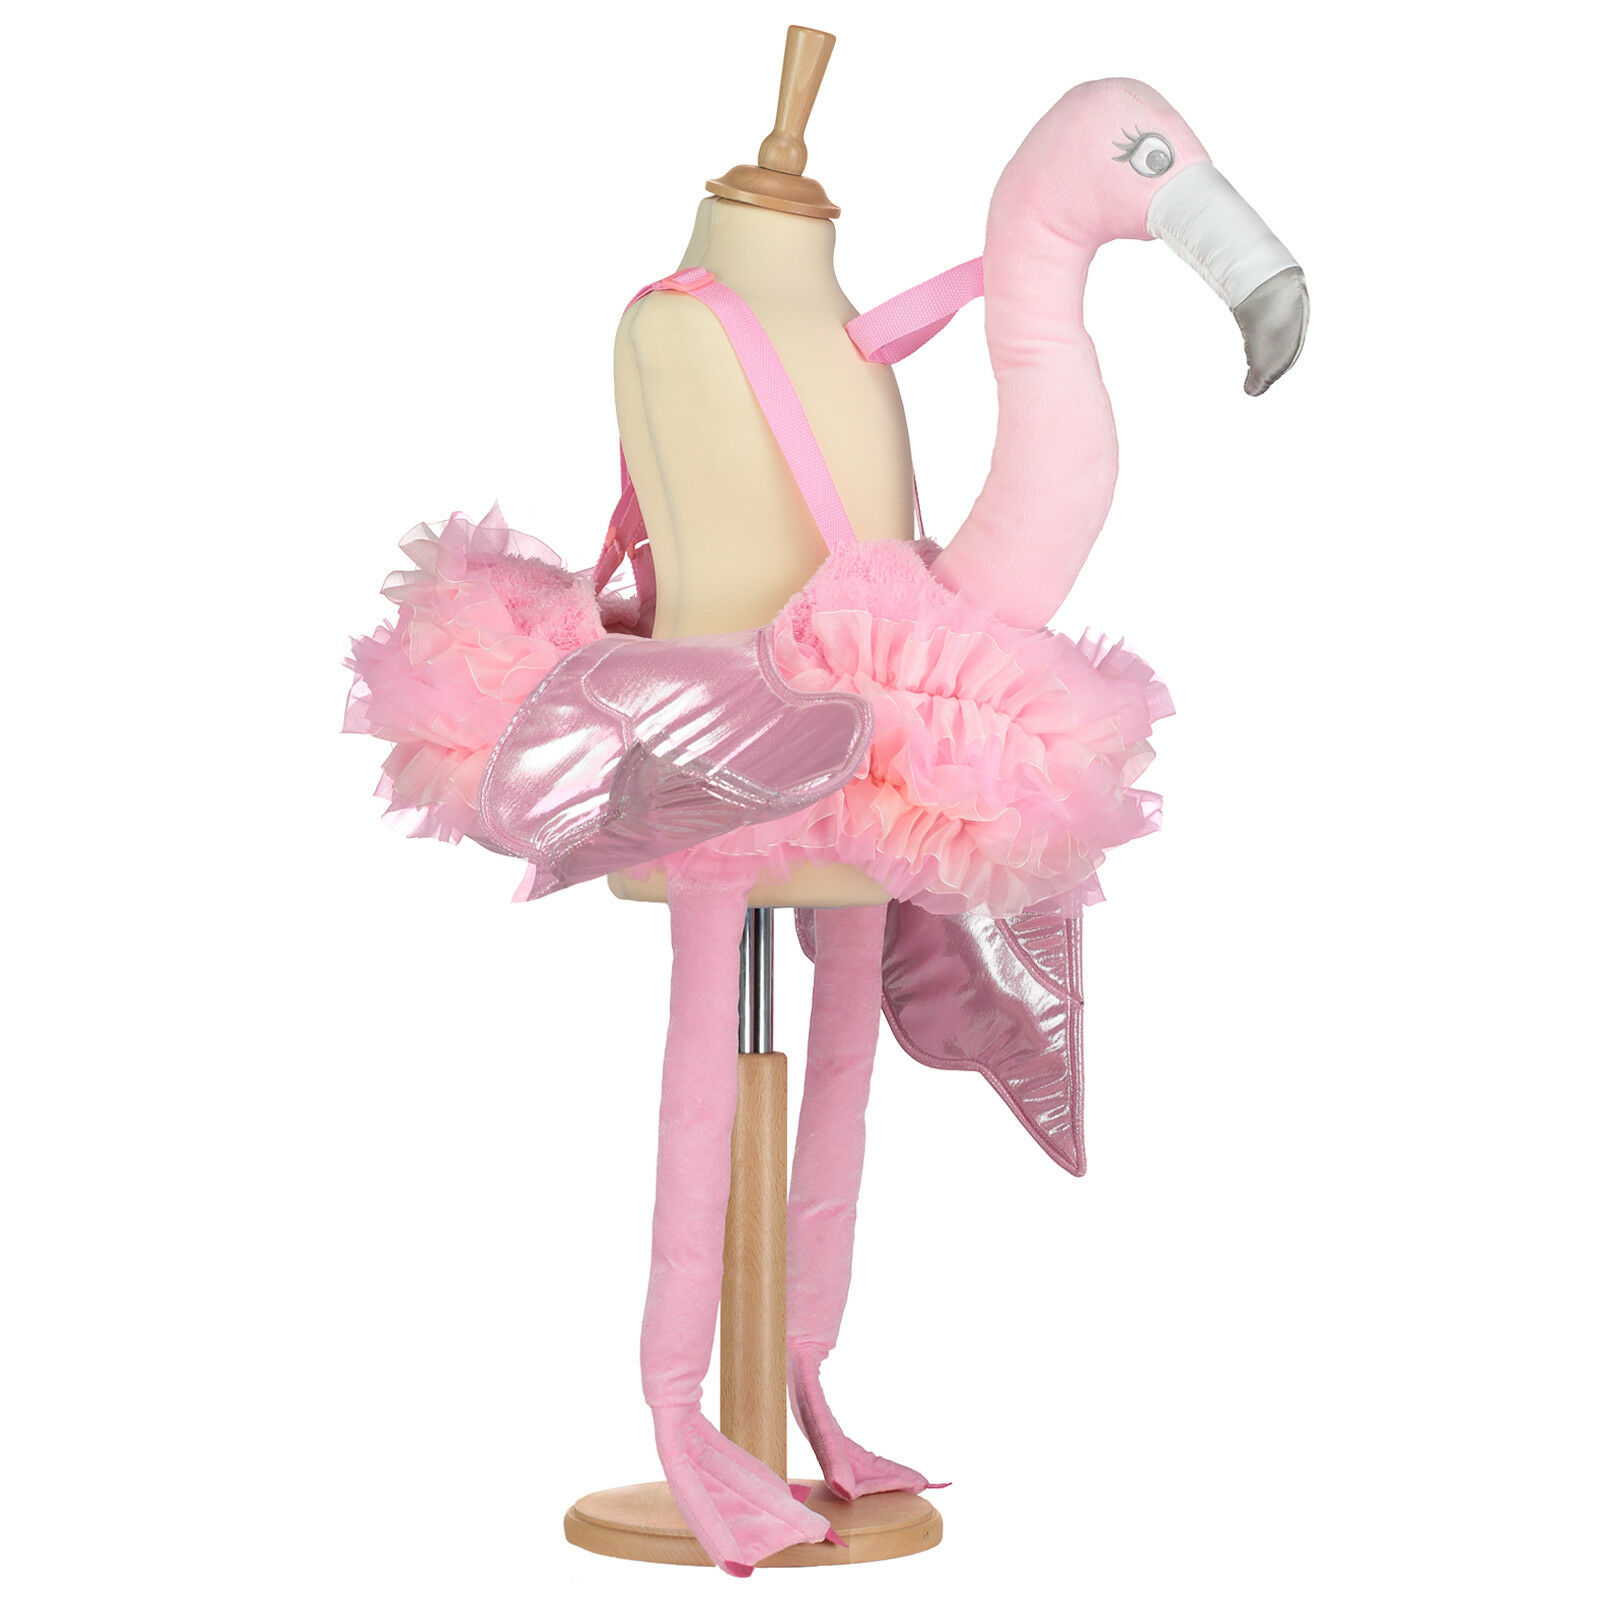 Fabulous Girls Kids Ruffle Ride on Toy Pink Flamingo Dress Up Costume Book Week